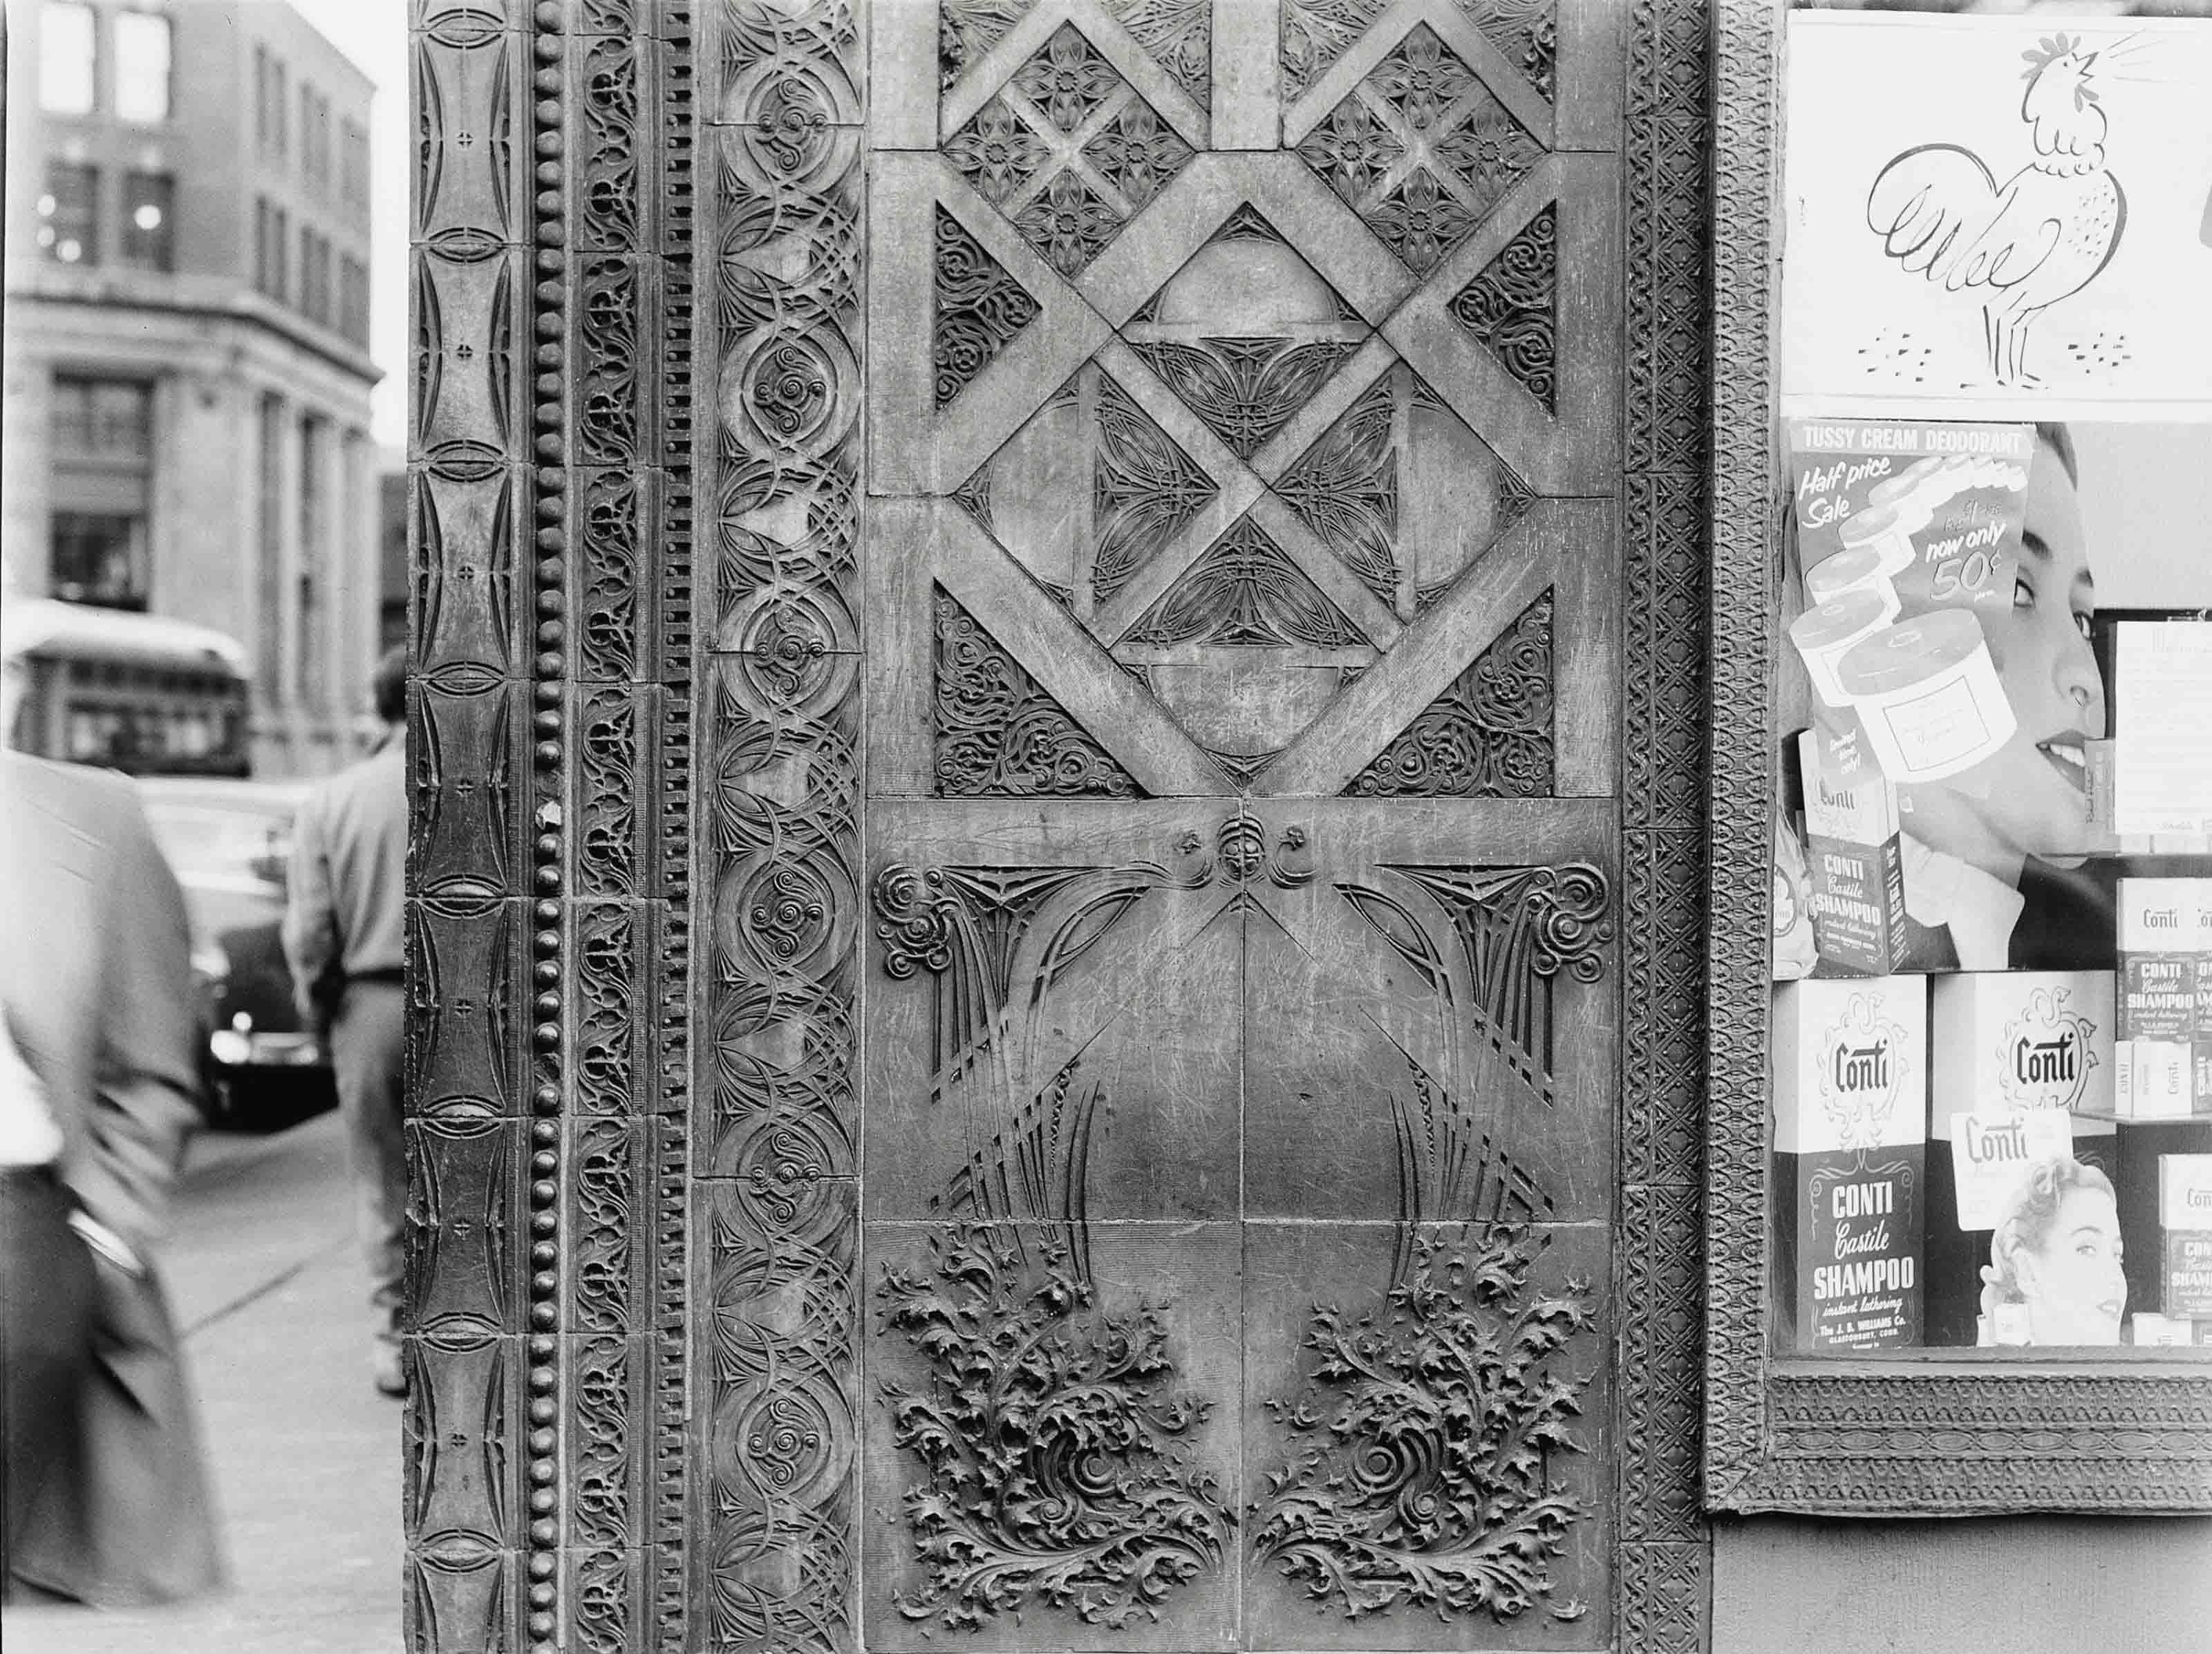 Prudential (Guaranty) Building, corner column, 1951-1952